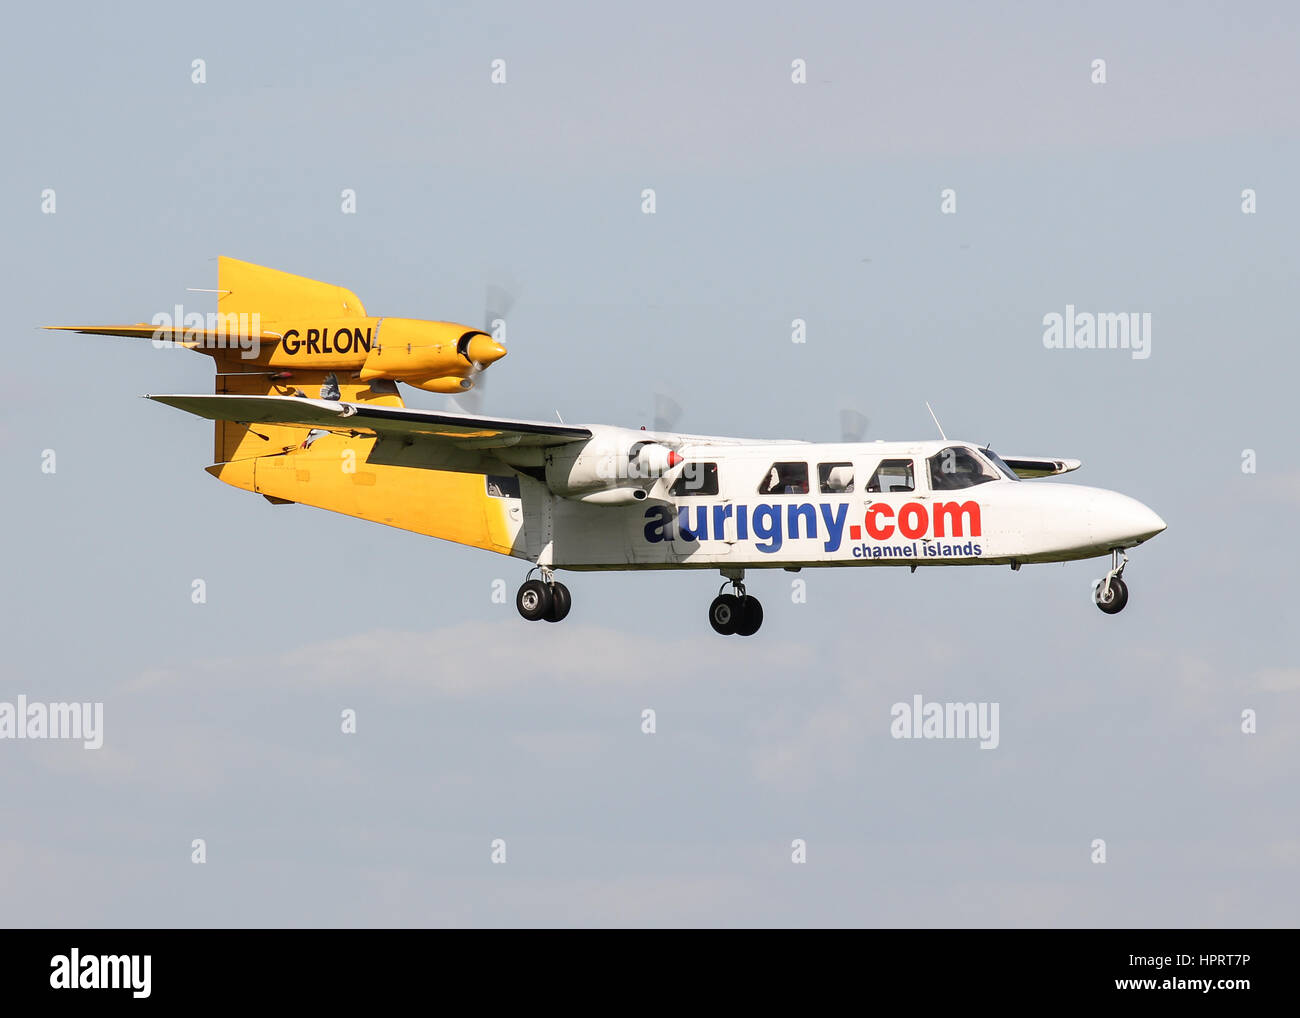 Aurigny Air Services Britten-Norman BN-2A Trislander G-RLON landing at Southampton Airport - Stock Image